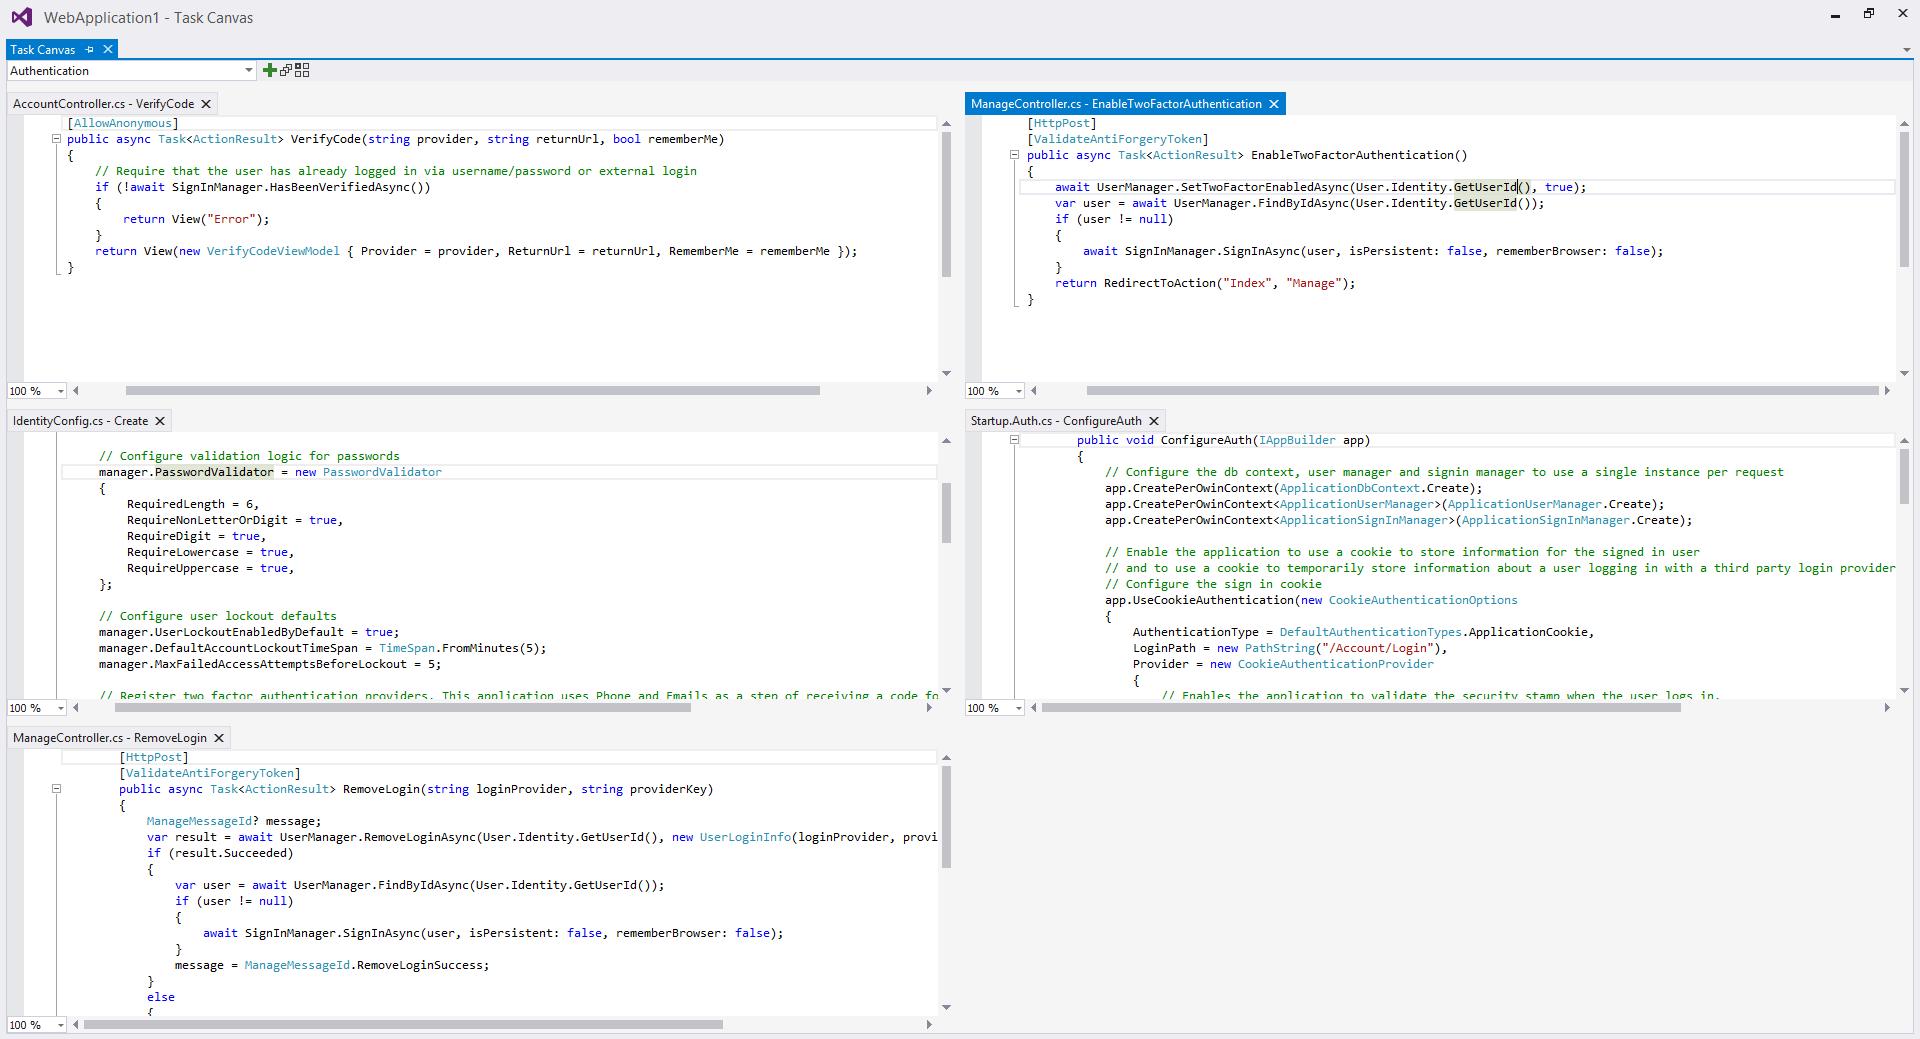 Code Editor Software, Task Canvas Screenshot